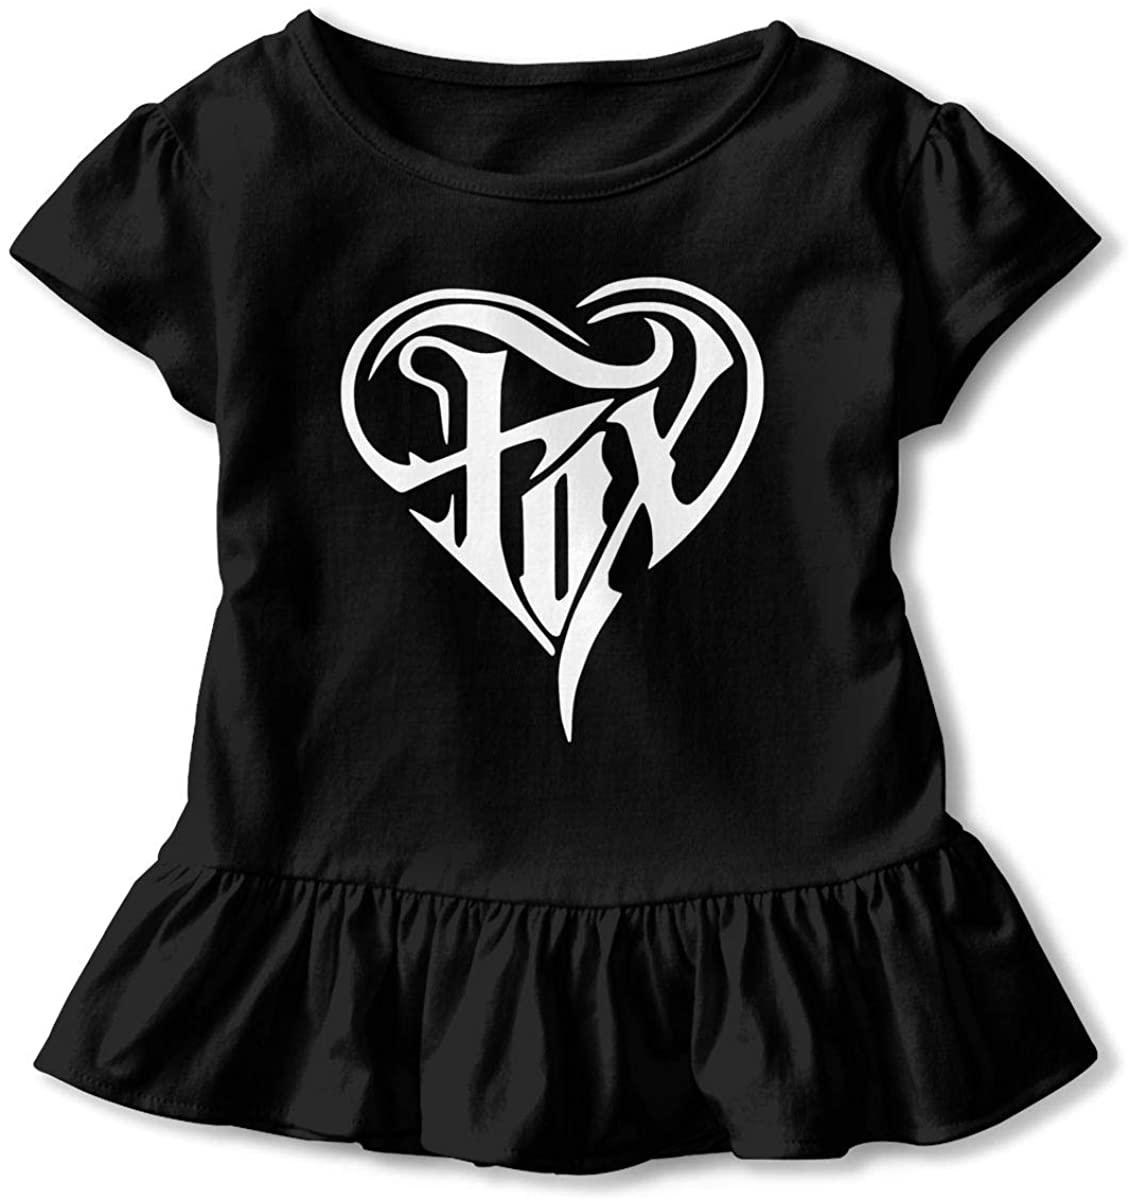 Fox Heart Girls Short Sleeve Ruffle Top Black